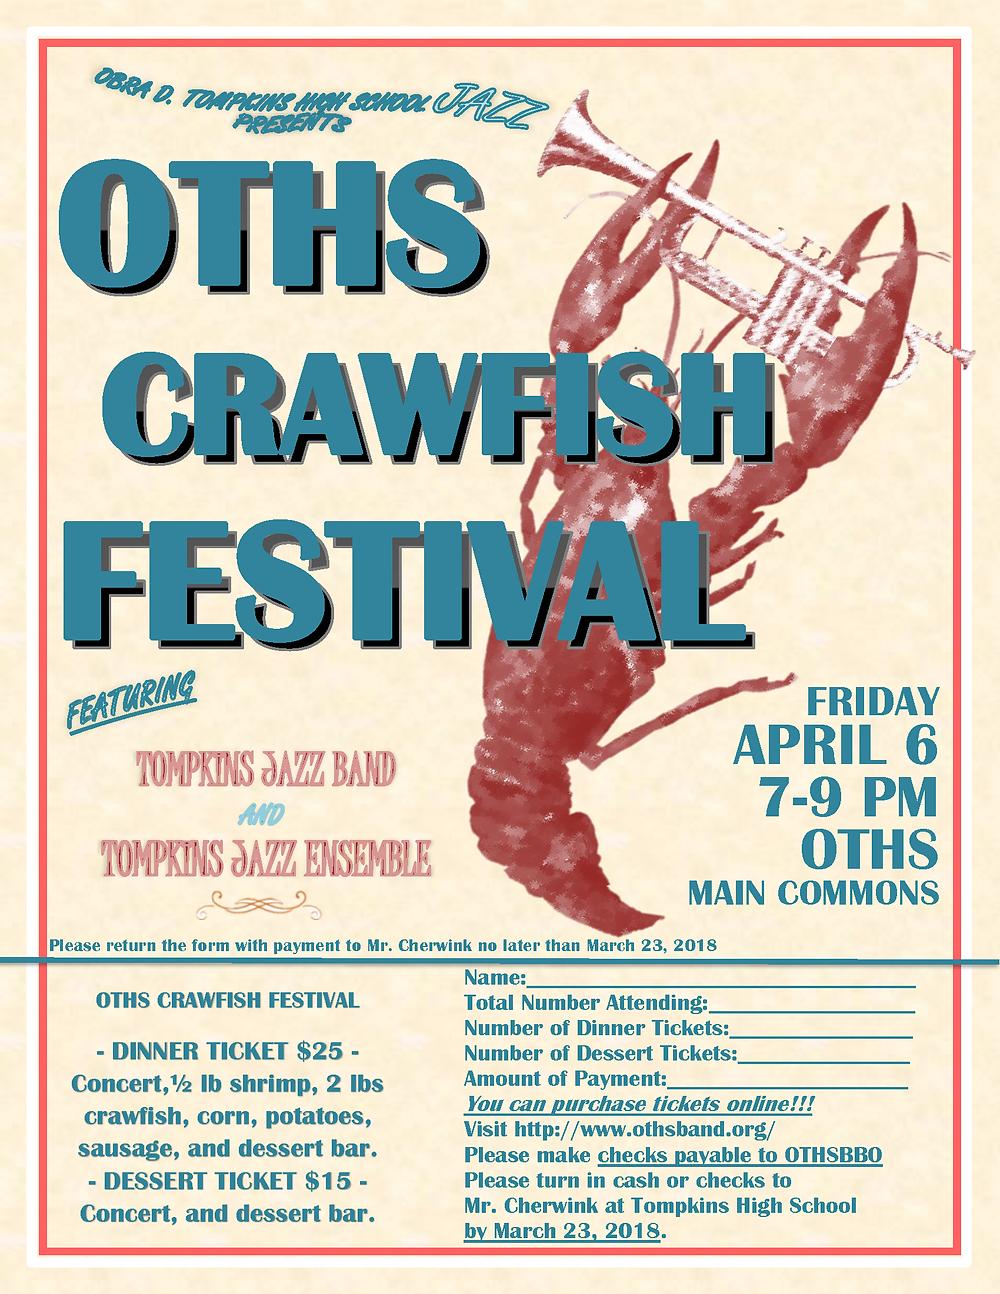 2018 OTHS Crawfish Festival